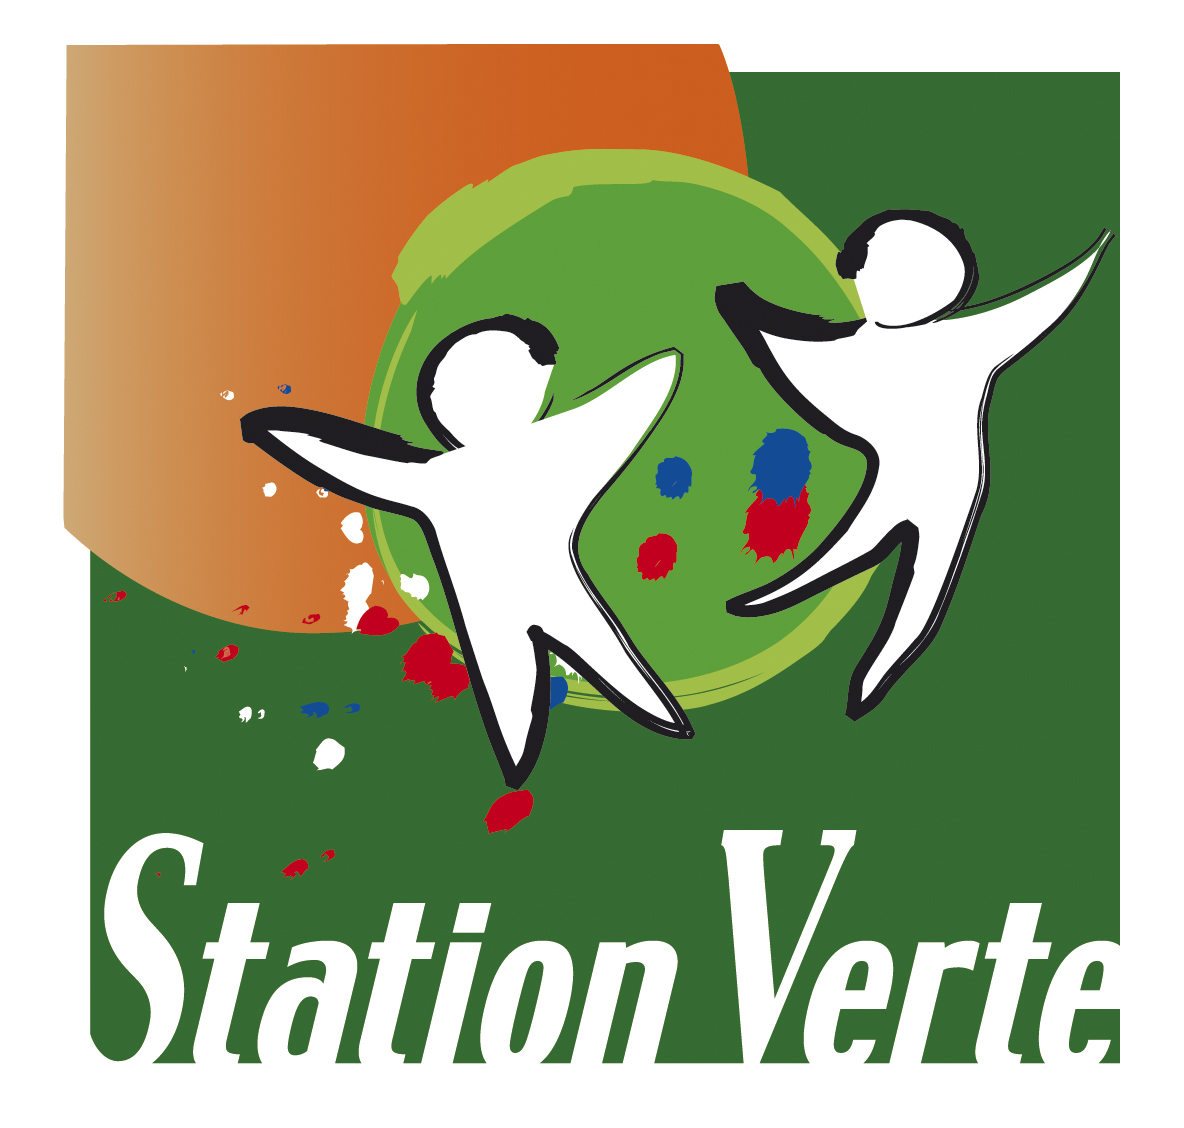 Station Verte de Vacance